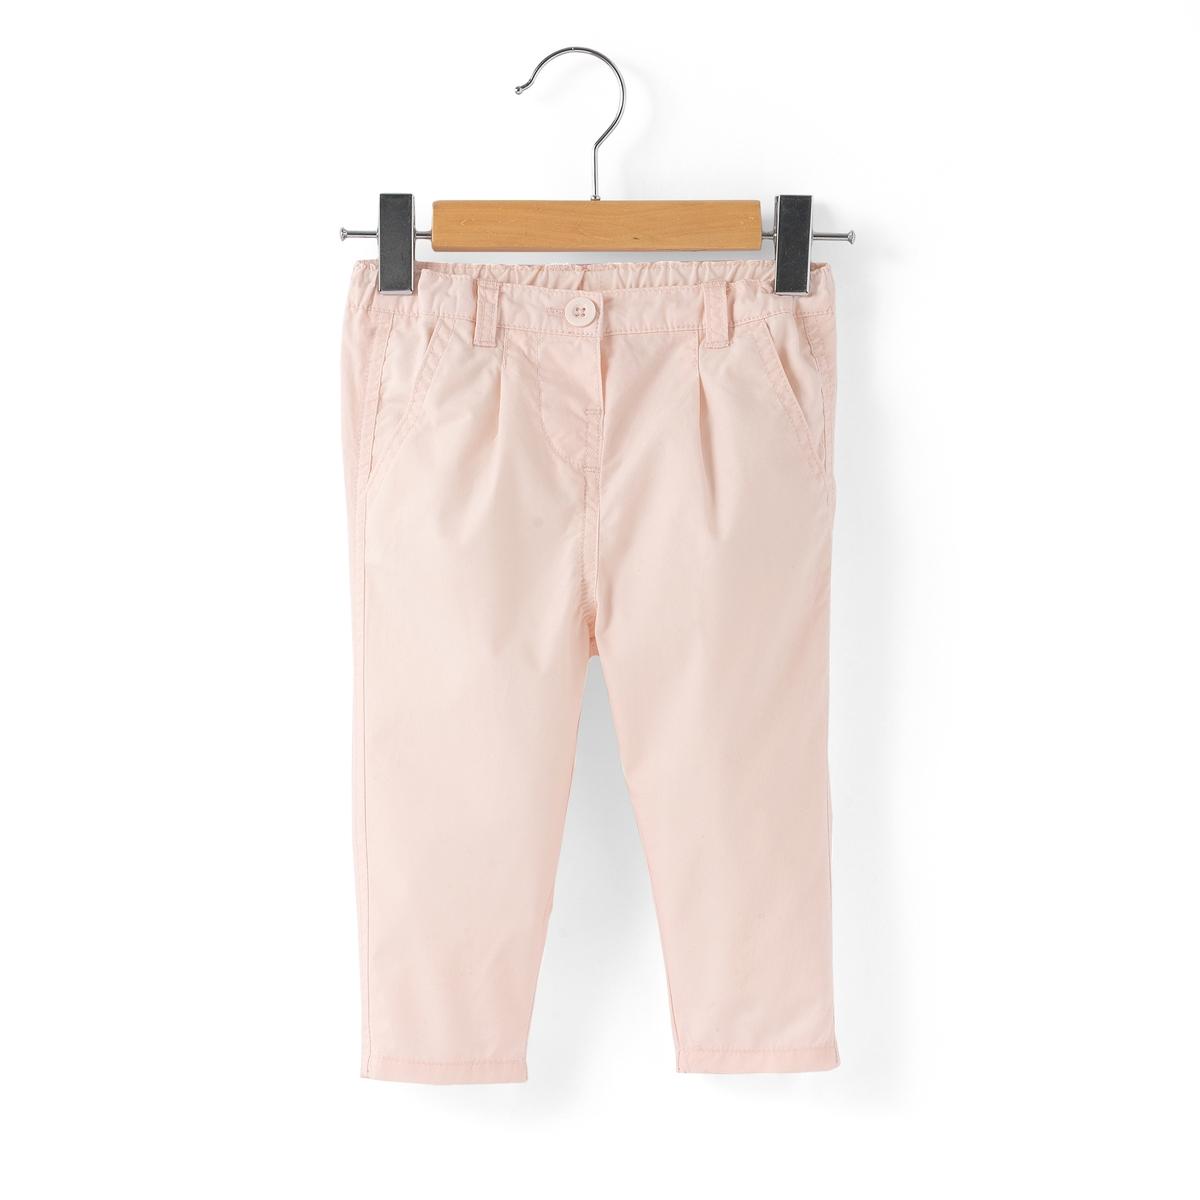 Брюки-чино брюки чино sandy fancy